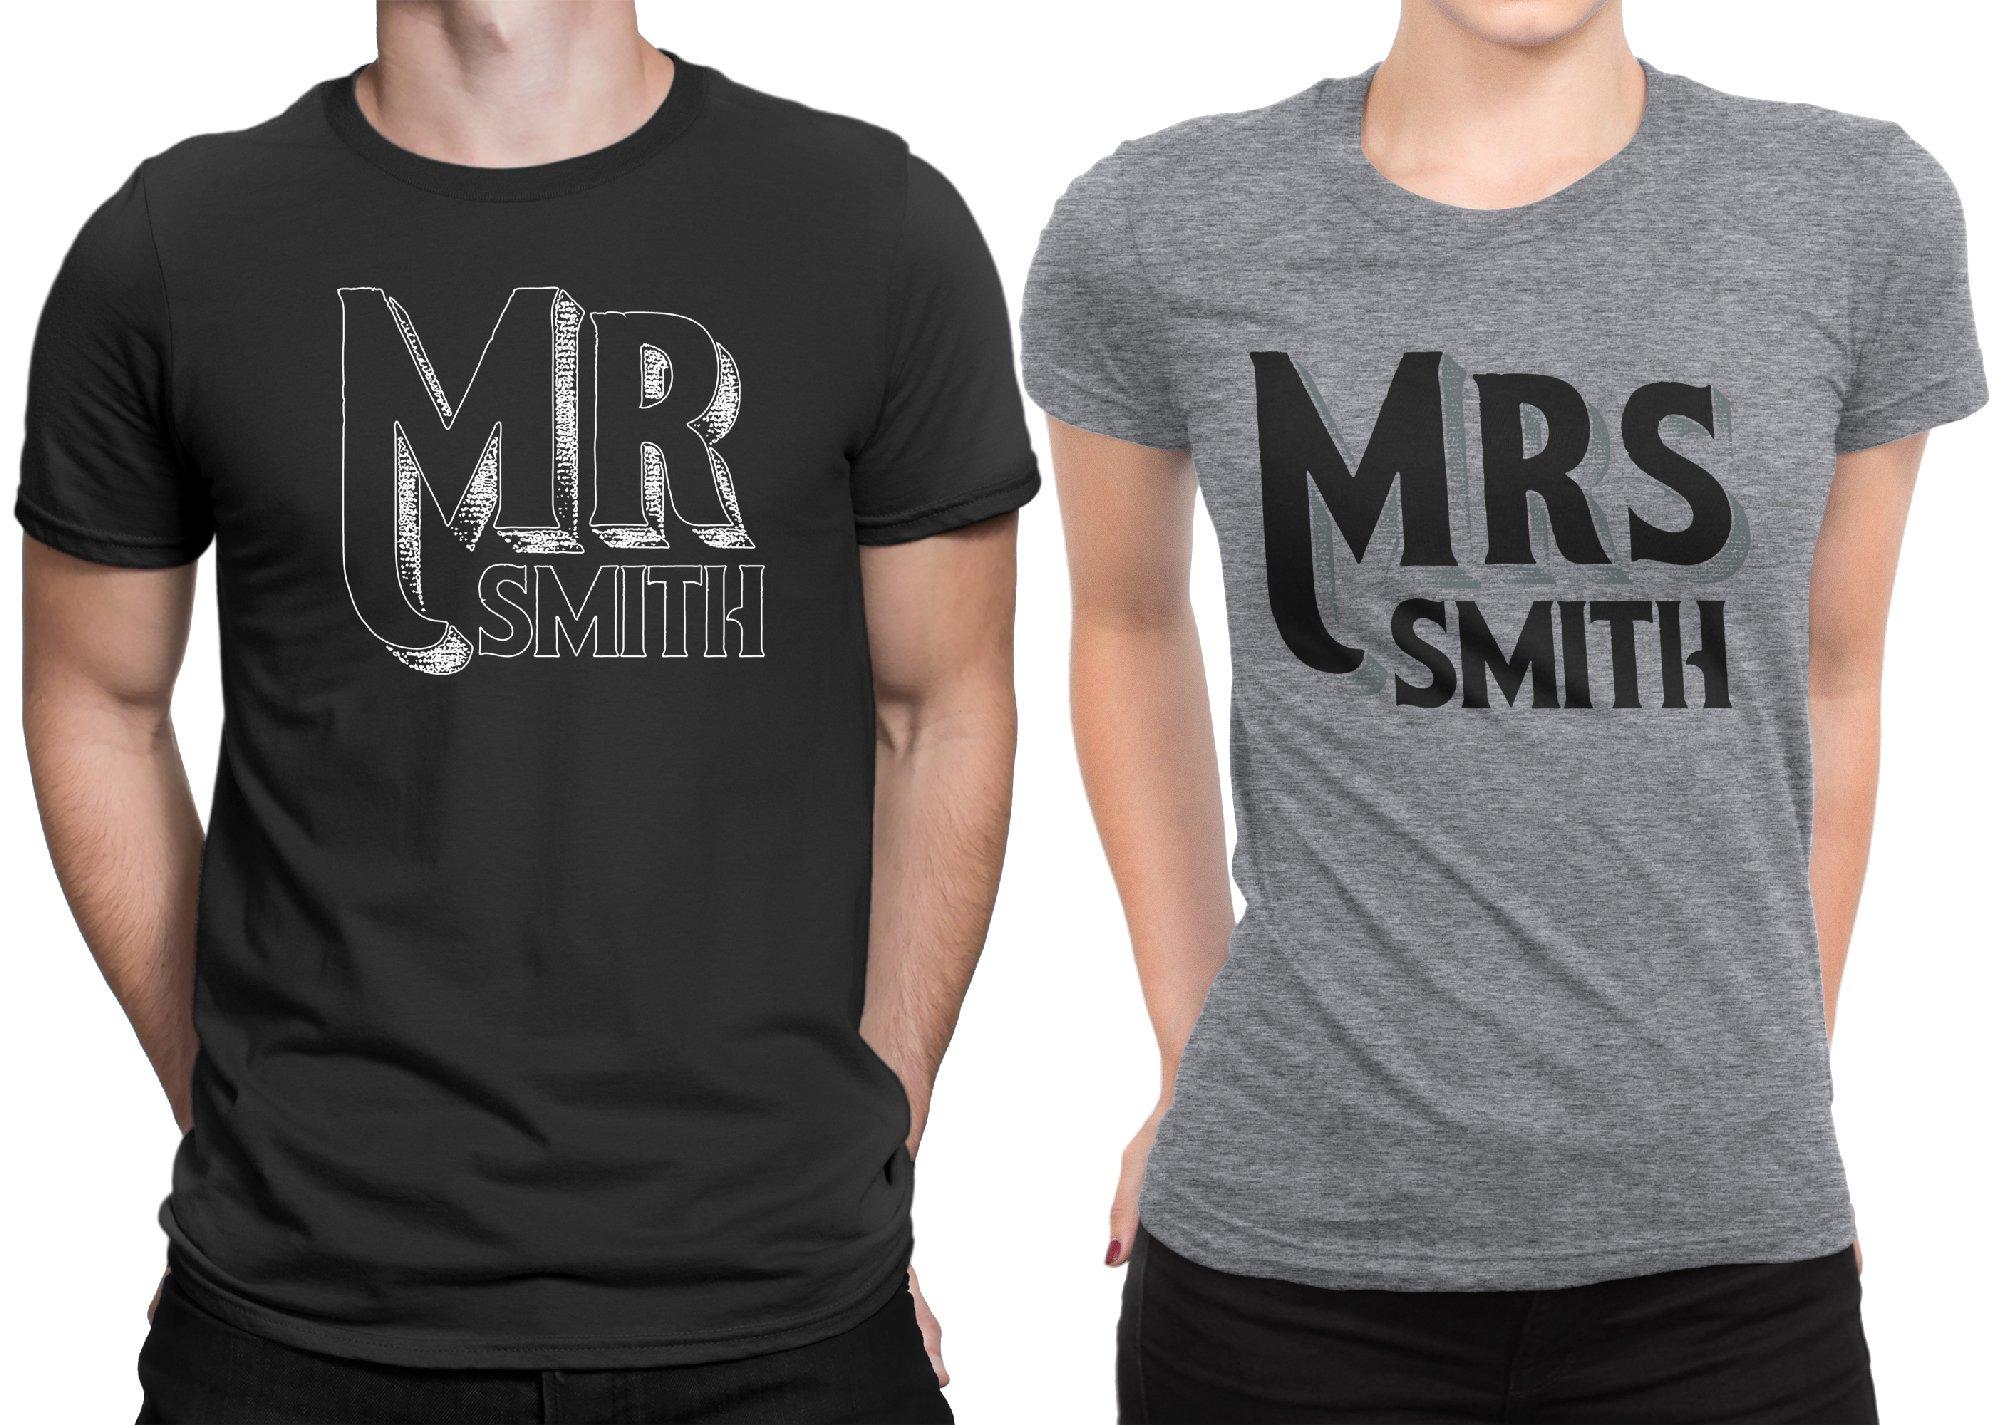 Mr Mrs Customized Lastname Married Couple Matching T-shirt Honeymoon valentines Men X-Large / Women X-Large | Black - Deep Heather